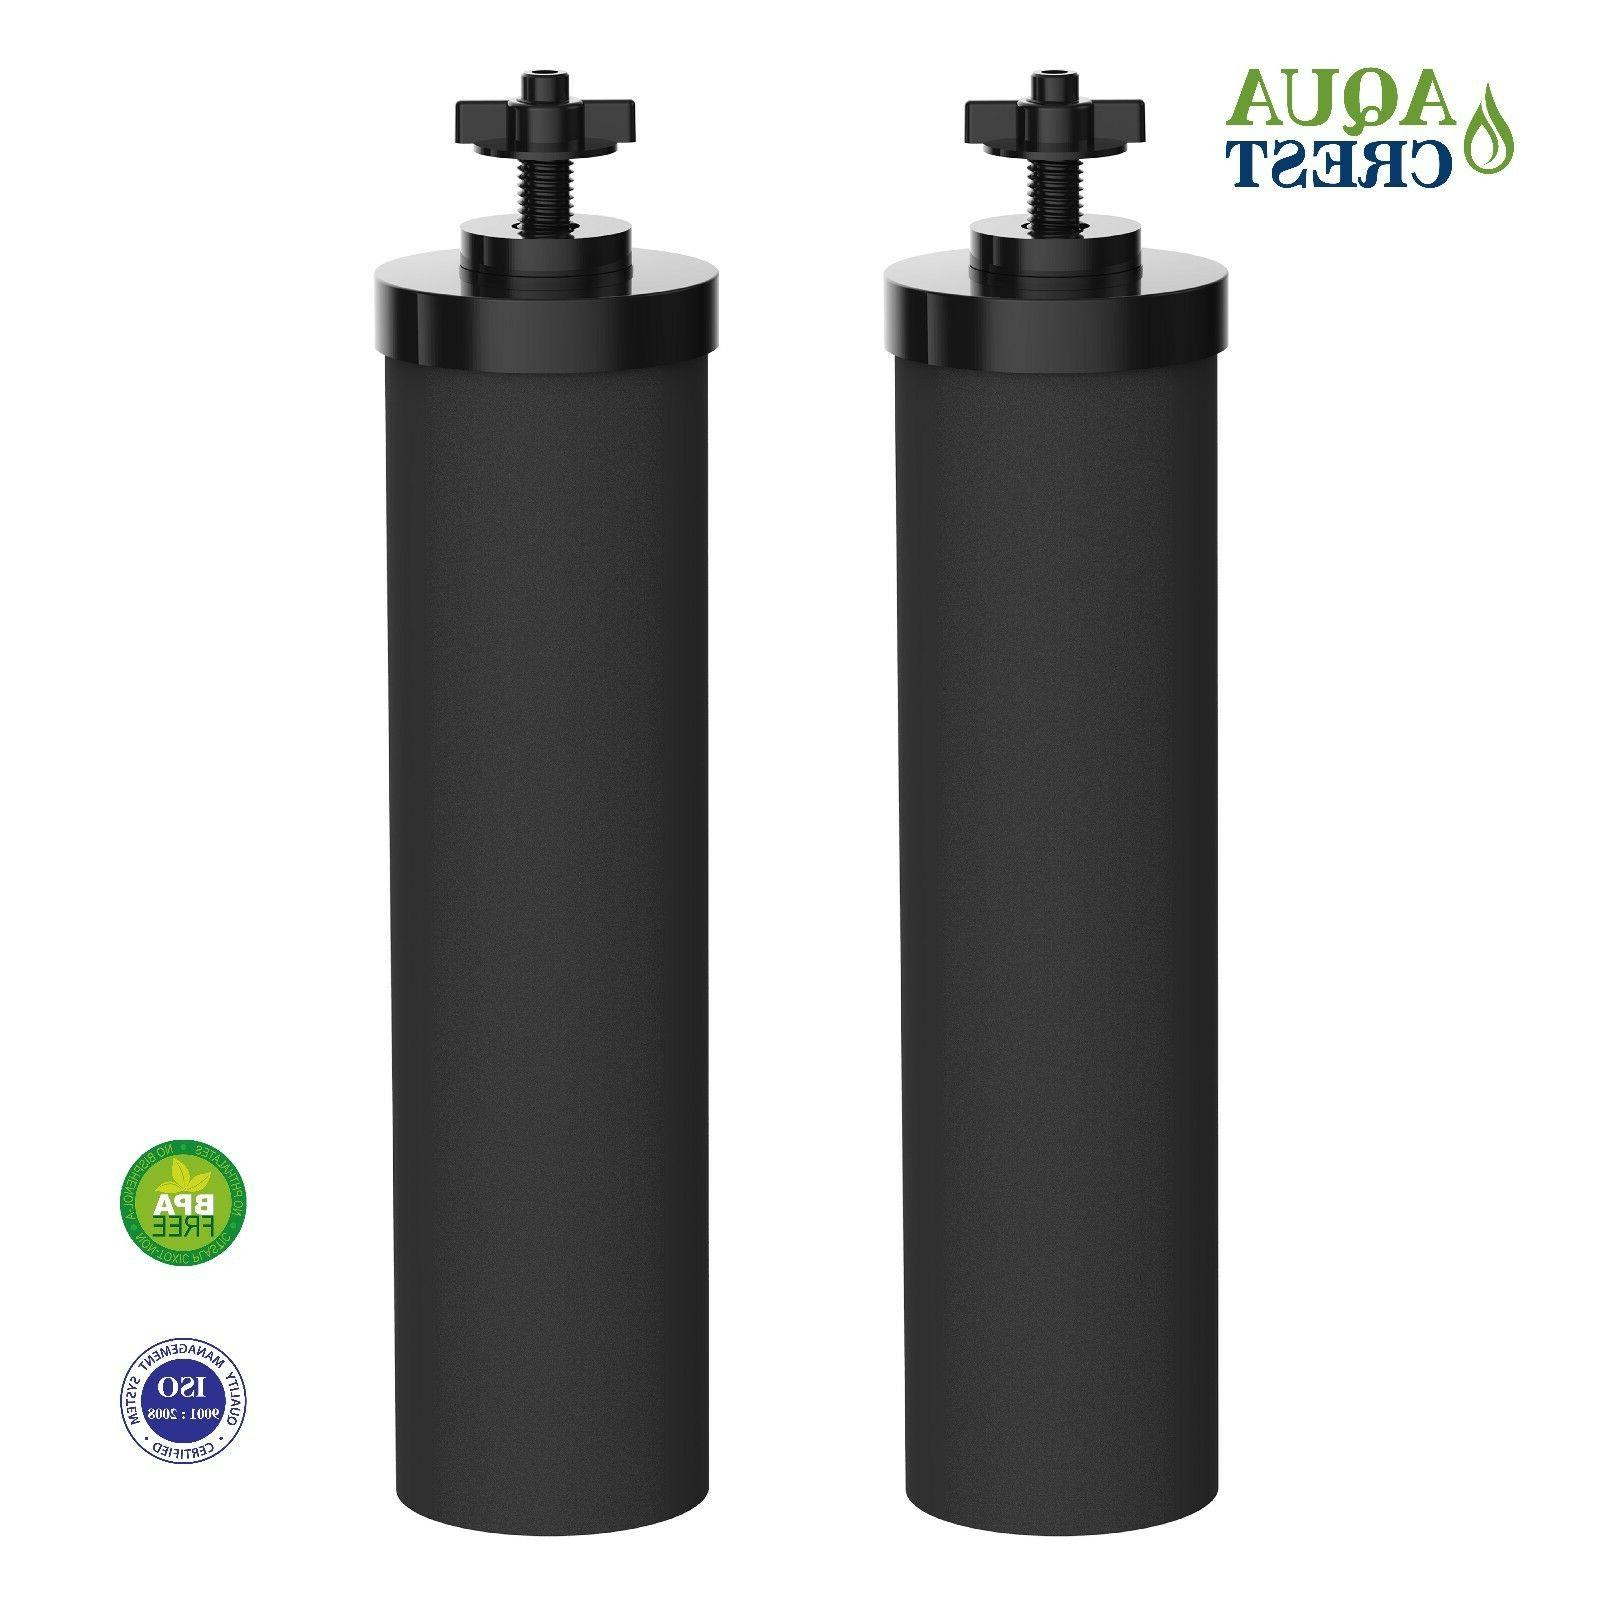 2 black berkey bb9 2 replacement water